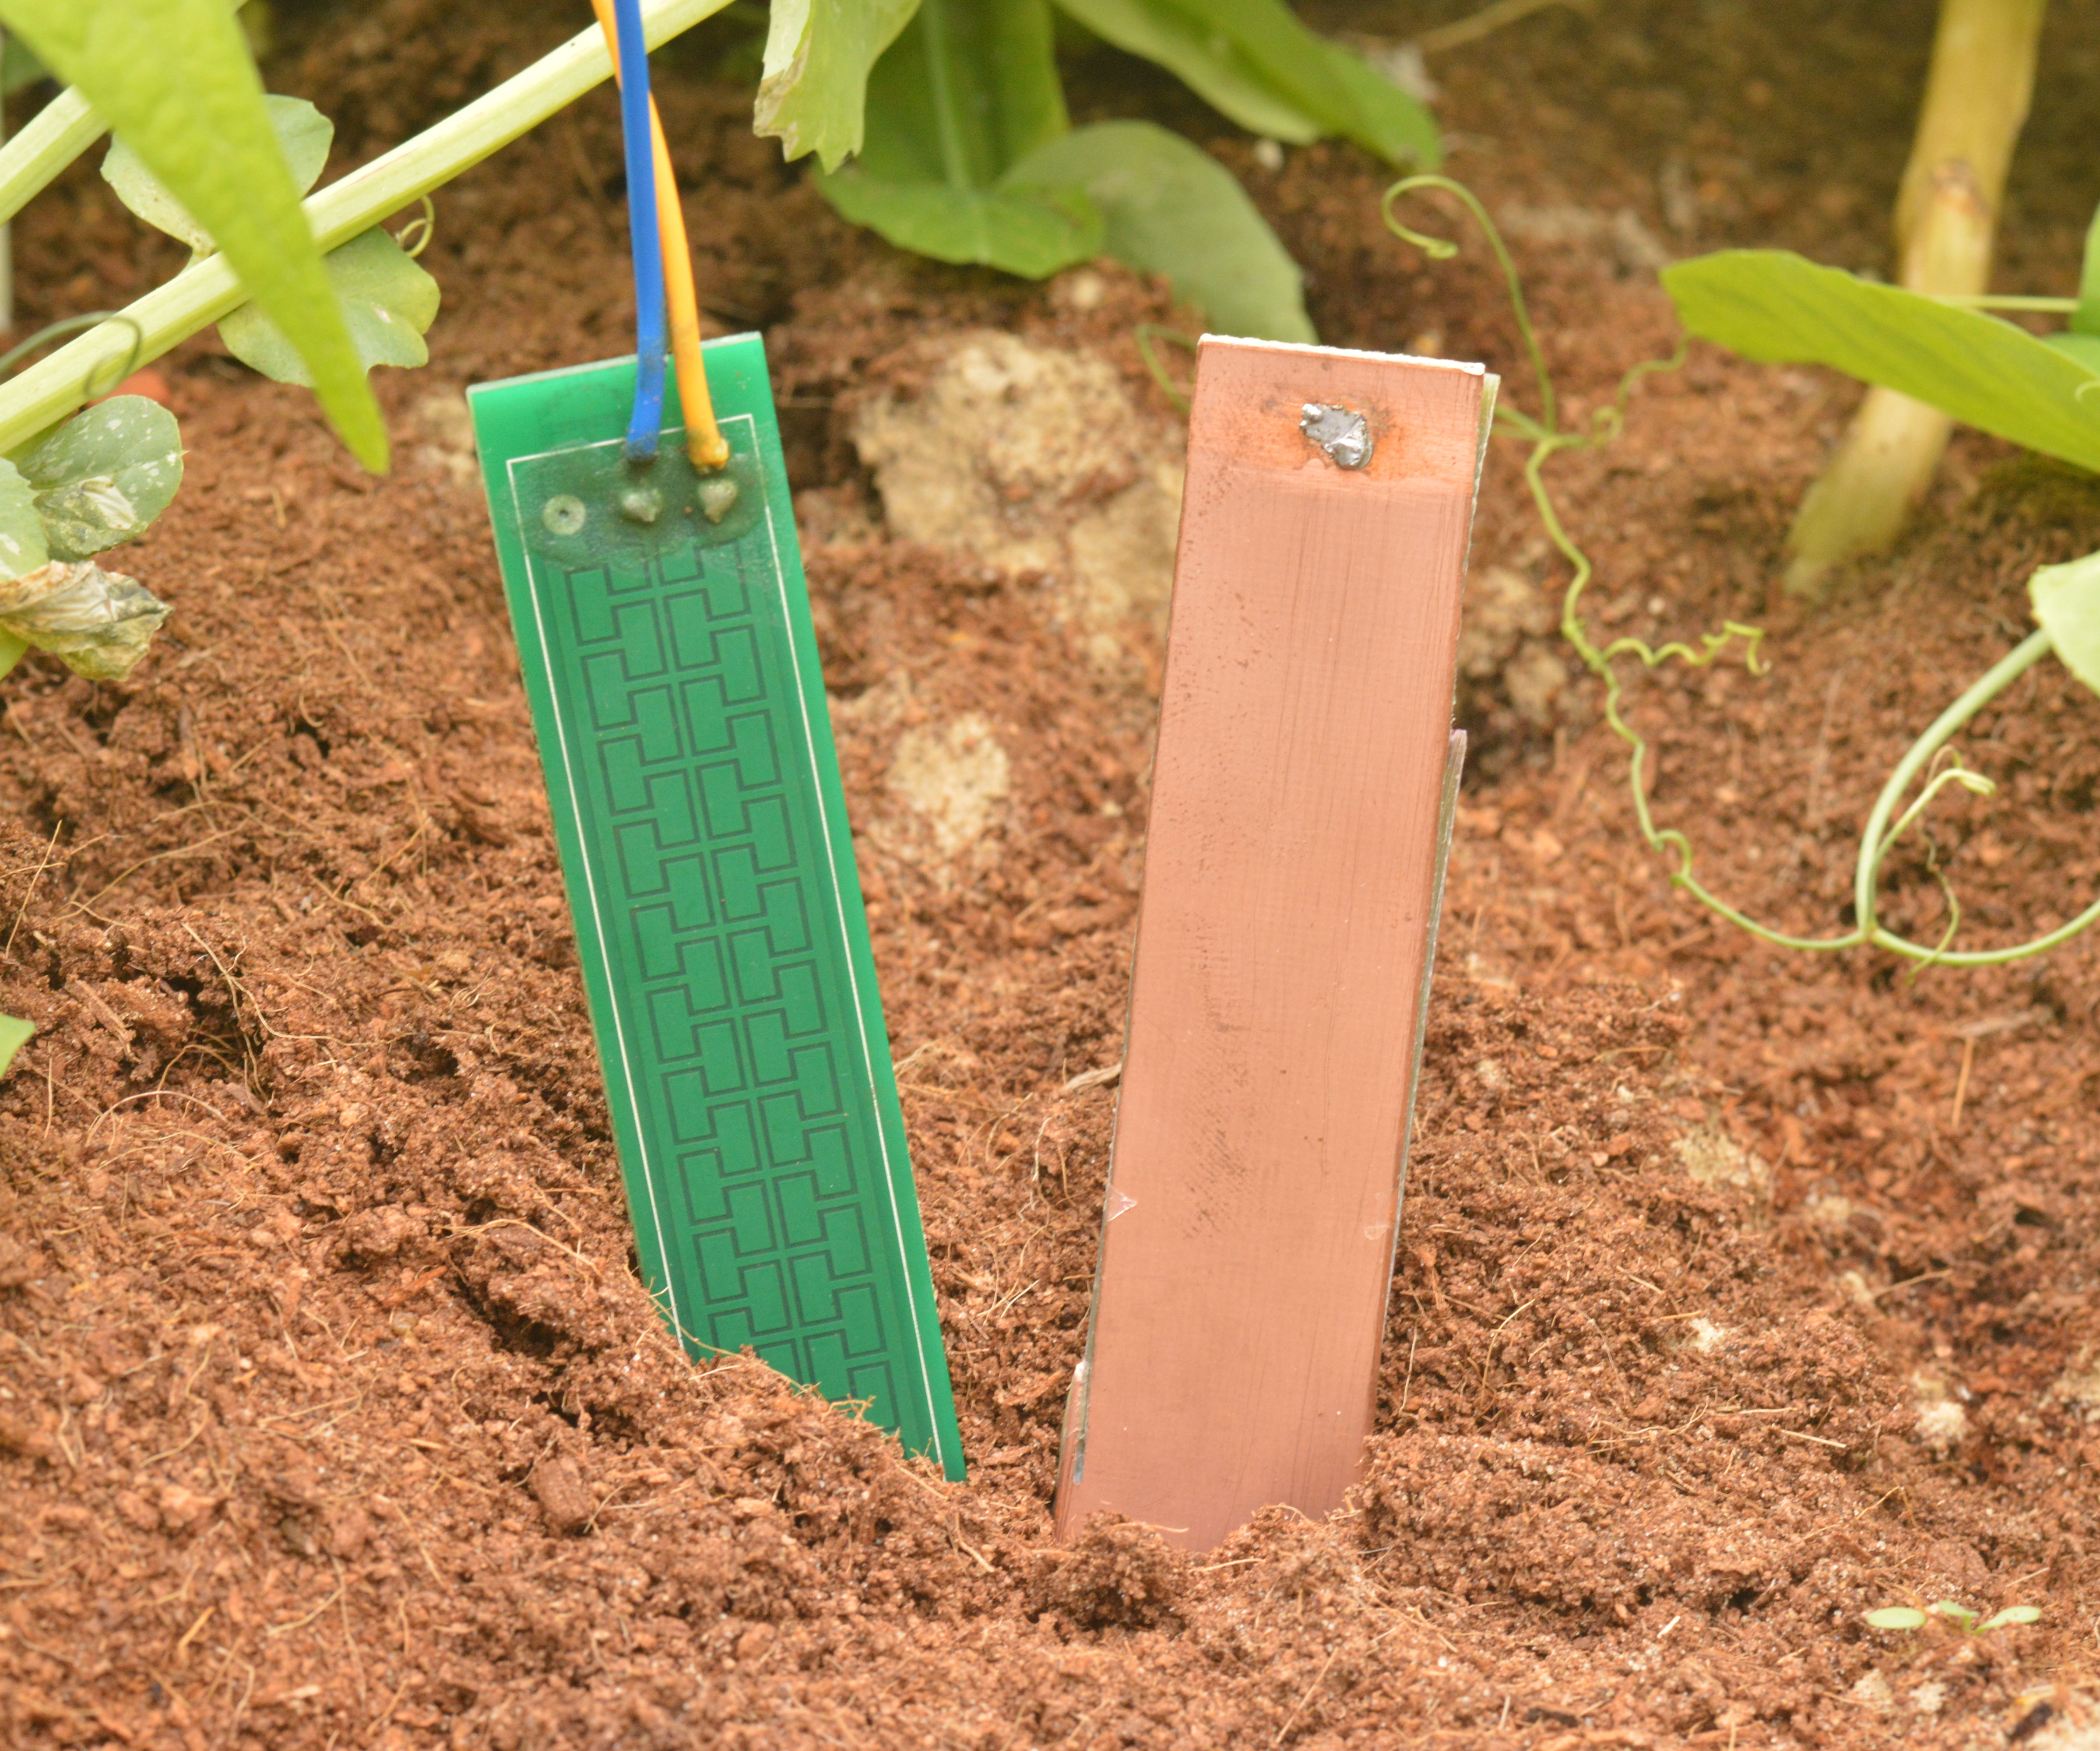 Comparison of capacitive soil probes